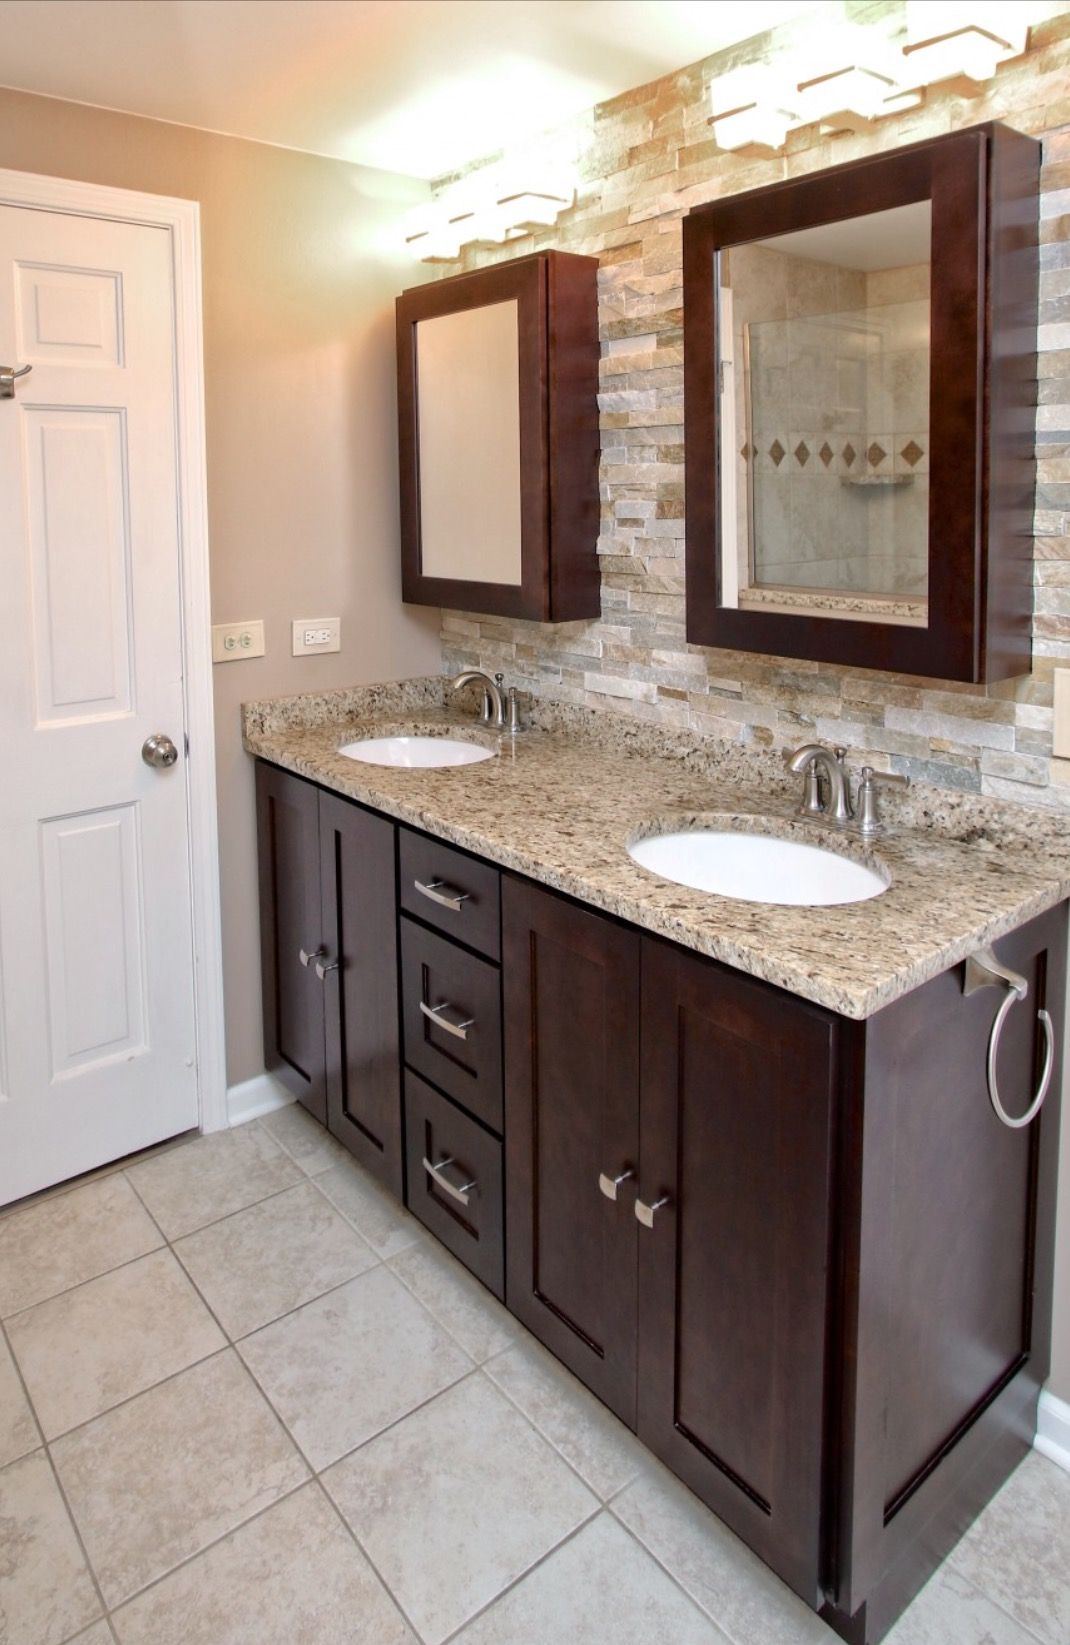 Espresso Shaker Bathroom Like The Wall Wood Bathroom Vanity Brown Bathroom Vanity Kitchen Cabinets In Bathroom